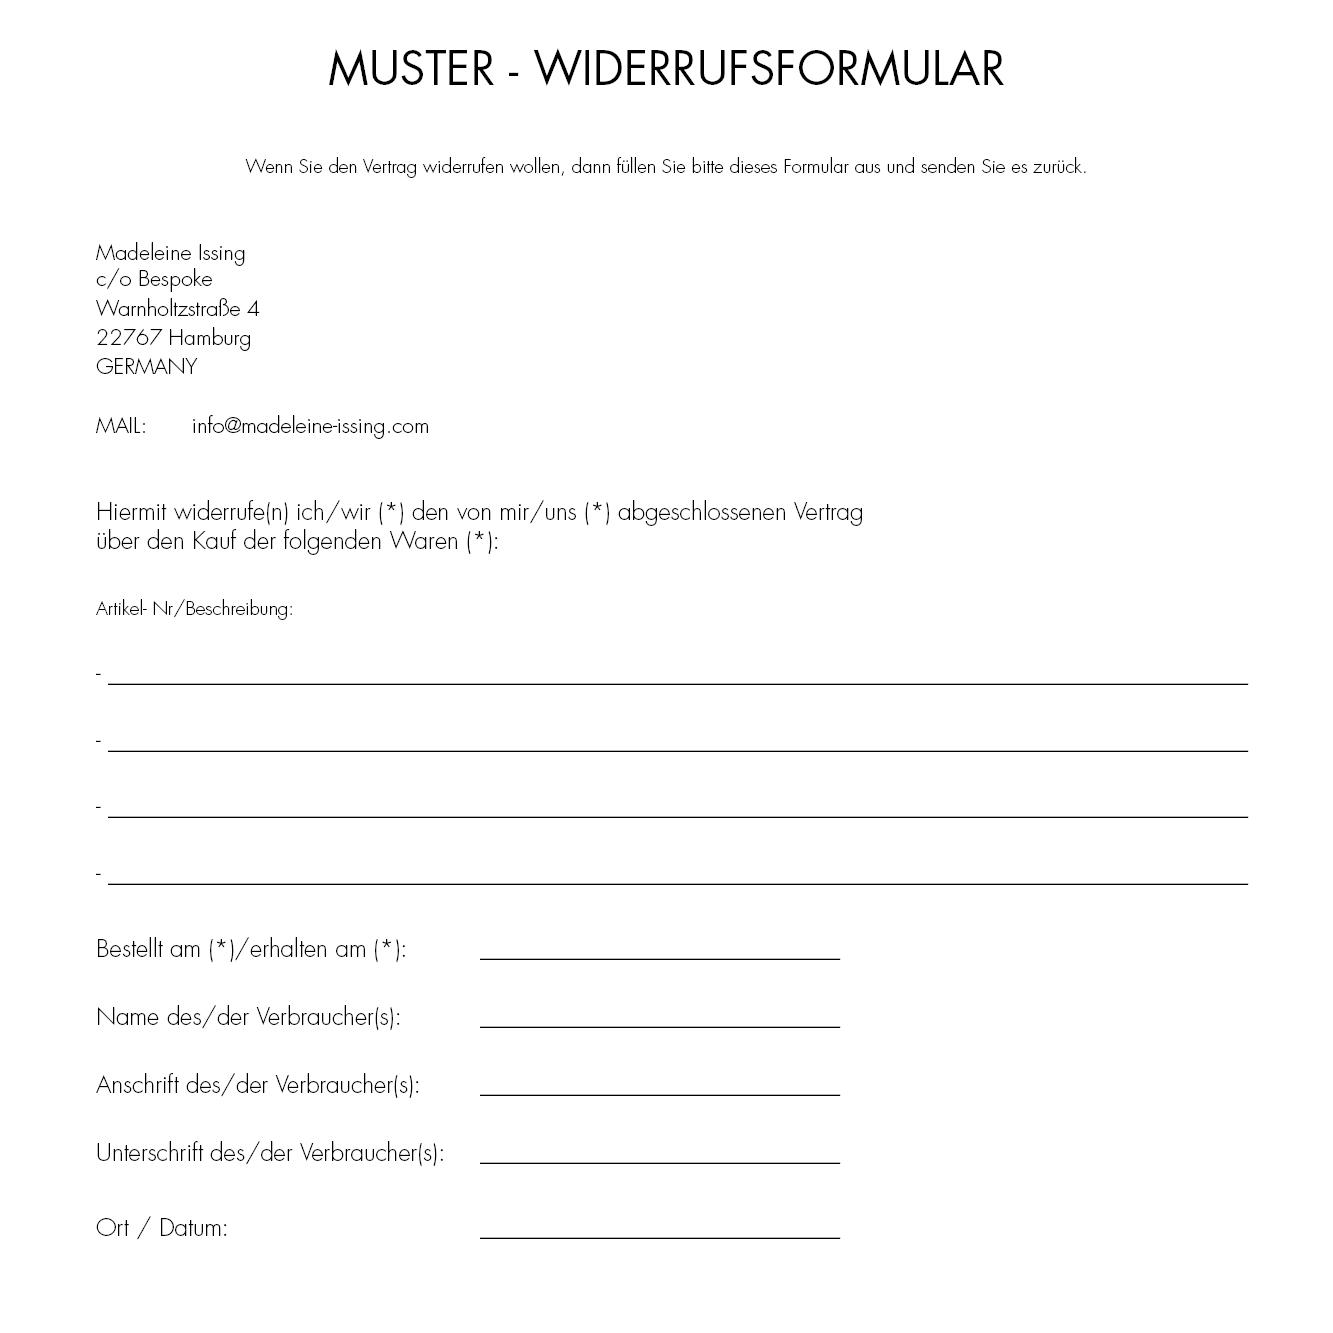 MDLN-ISNG_MUSTER-WIDERRUFSFORMULAR_2019